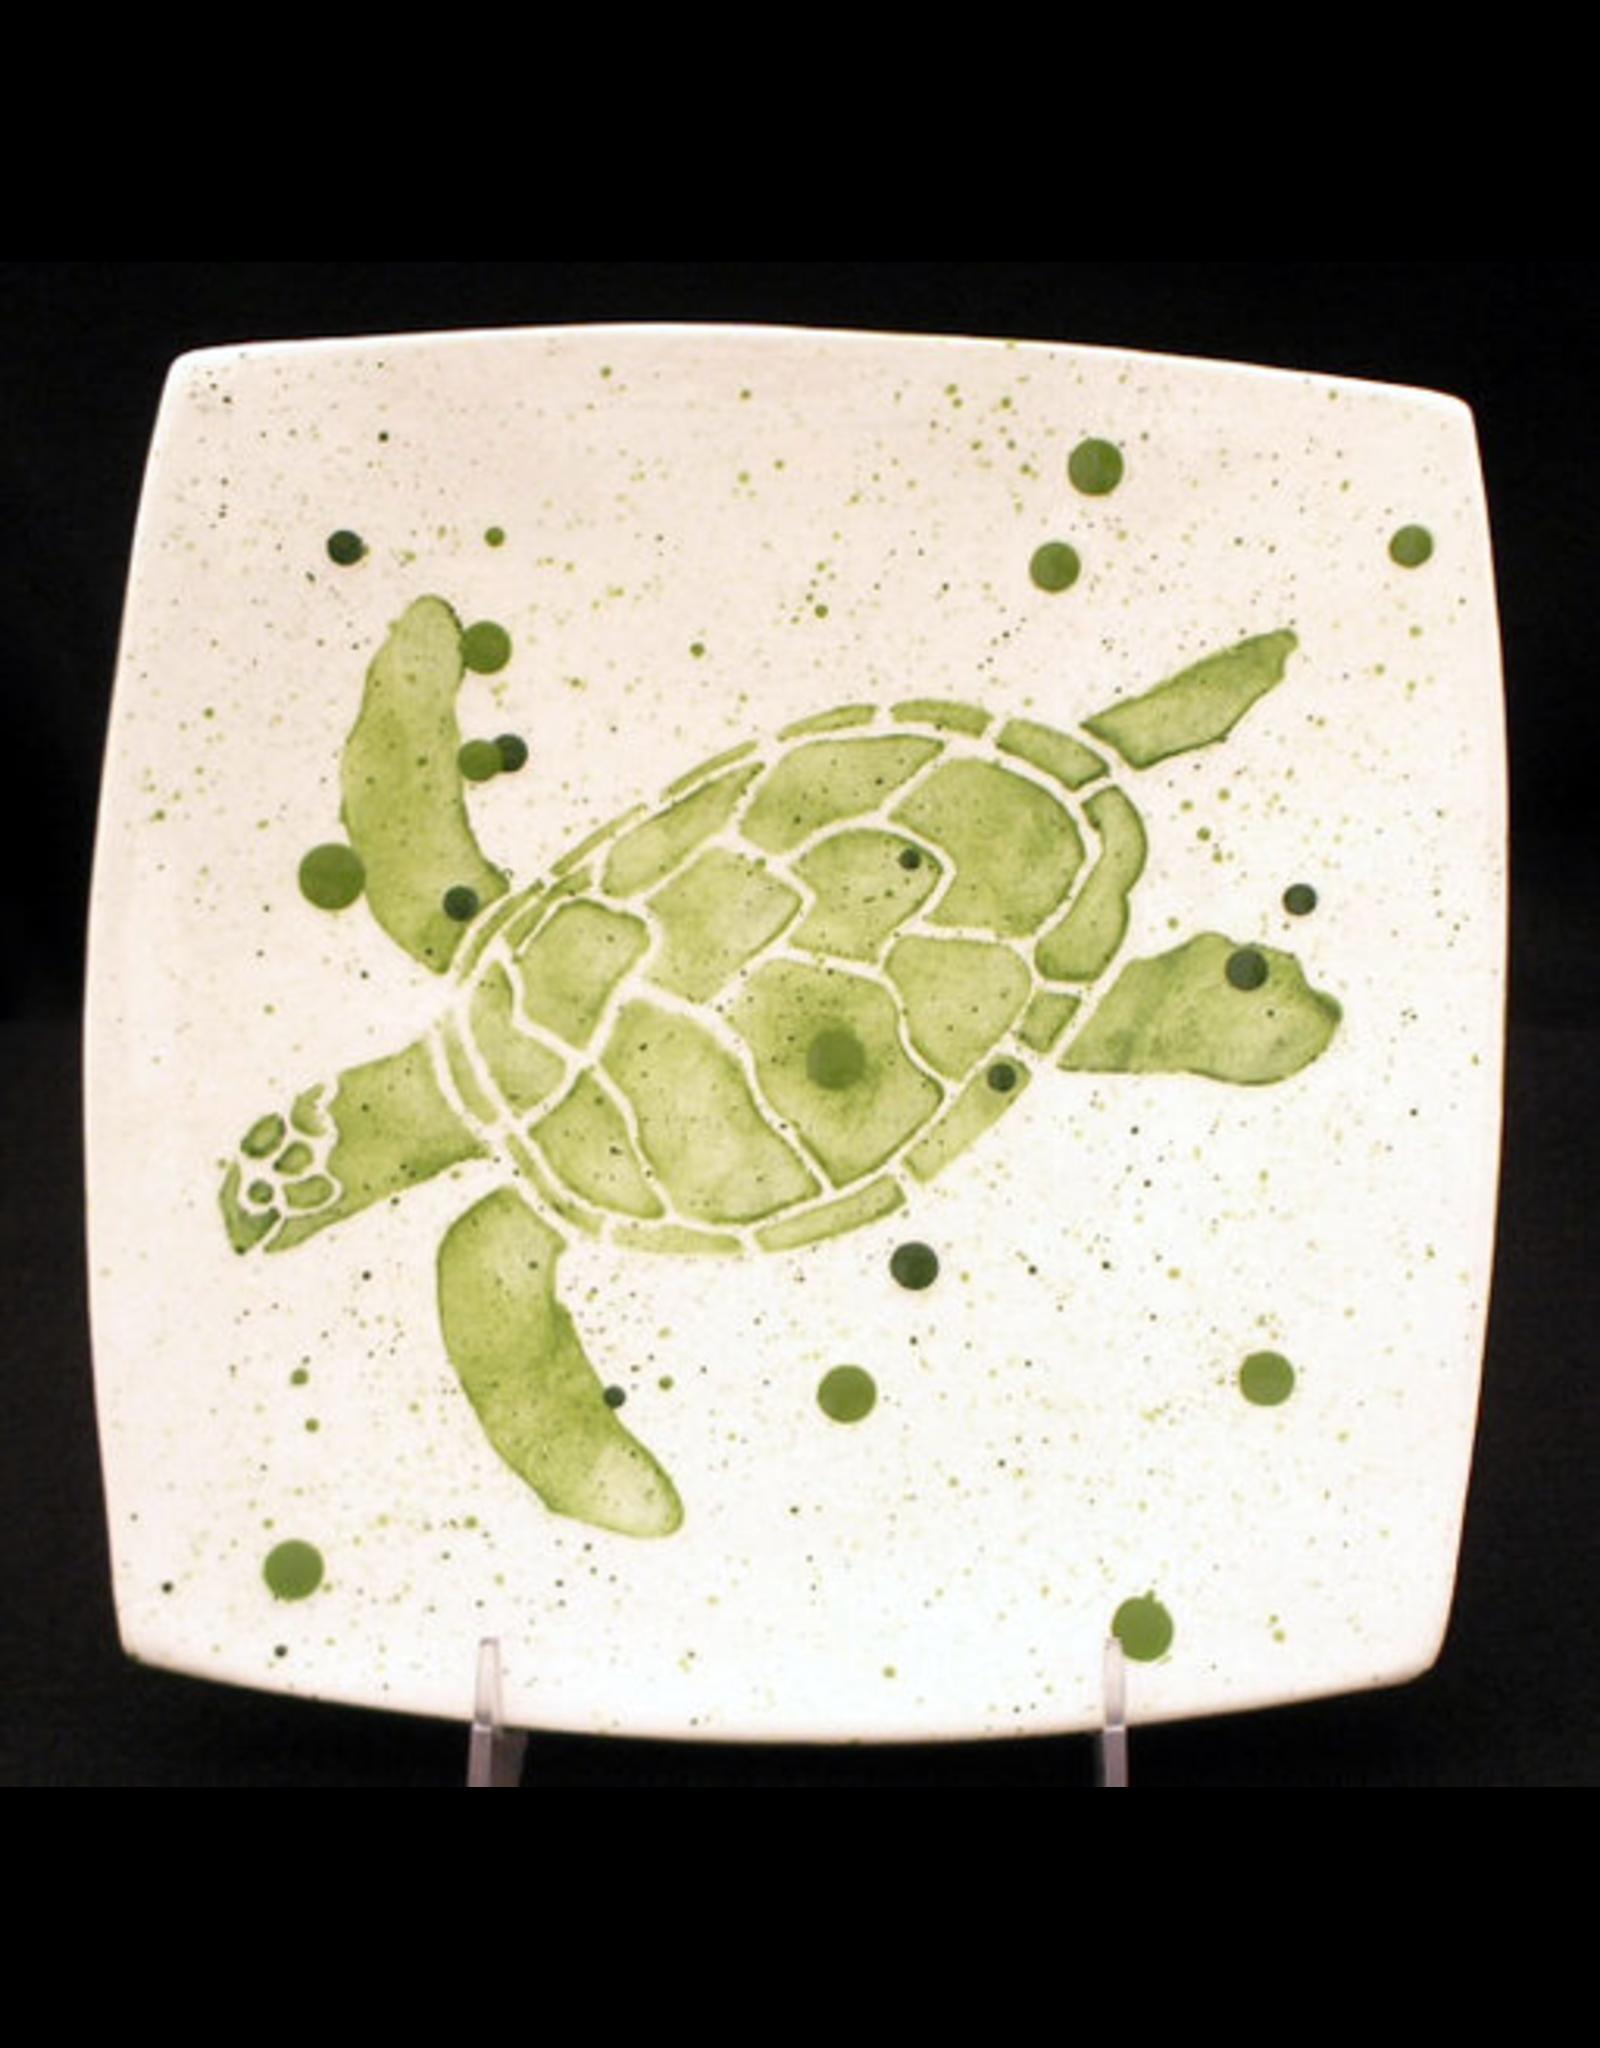 "Sara Hunter Plate (Sea Turtle, 8.5""SQ., SARH)"